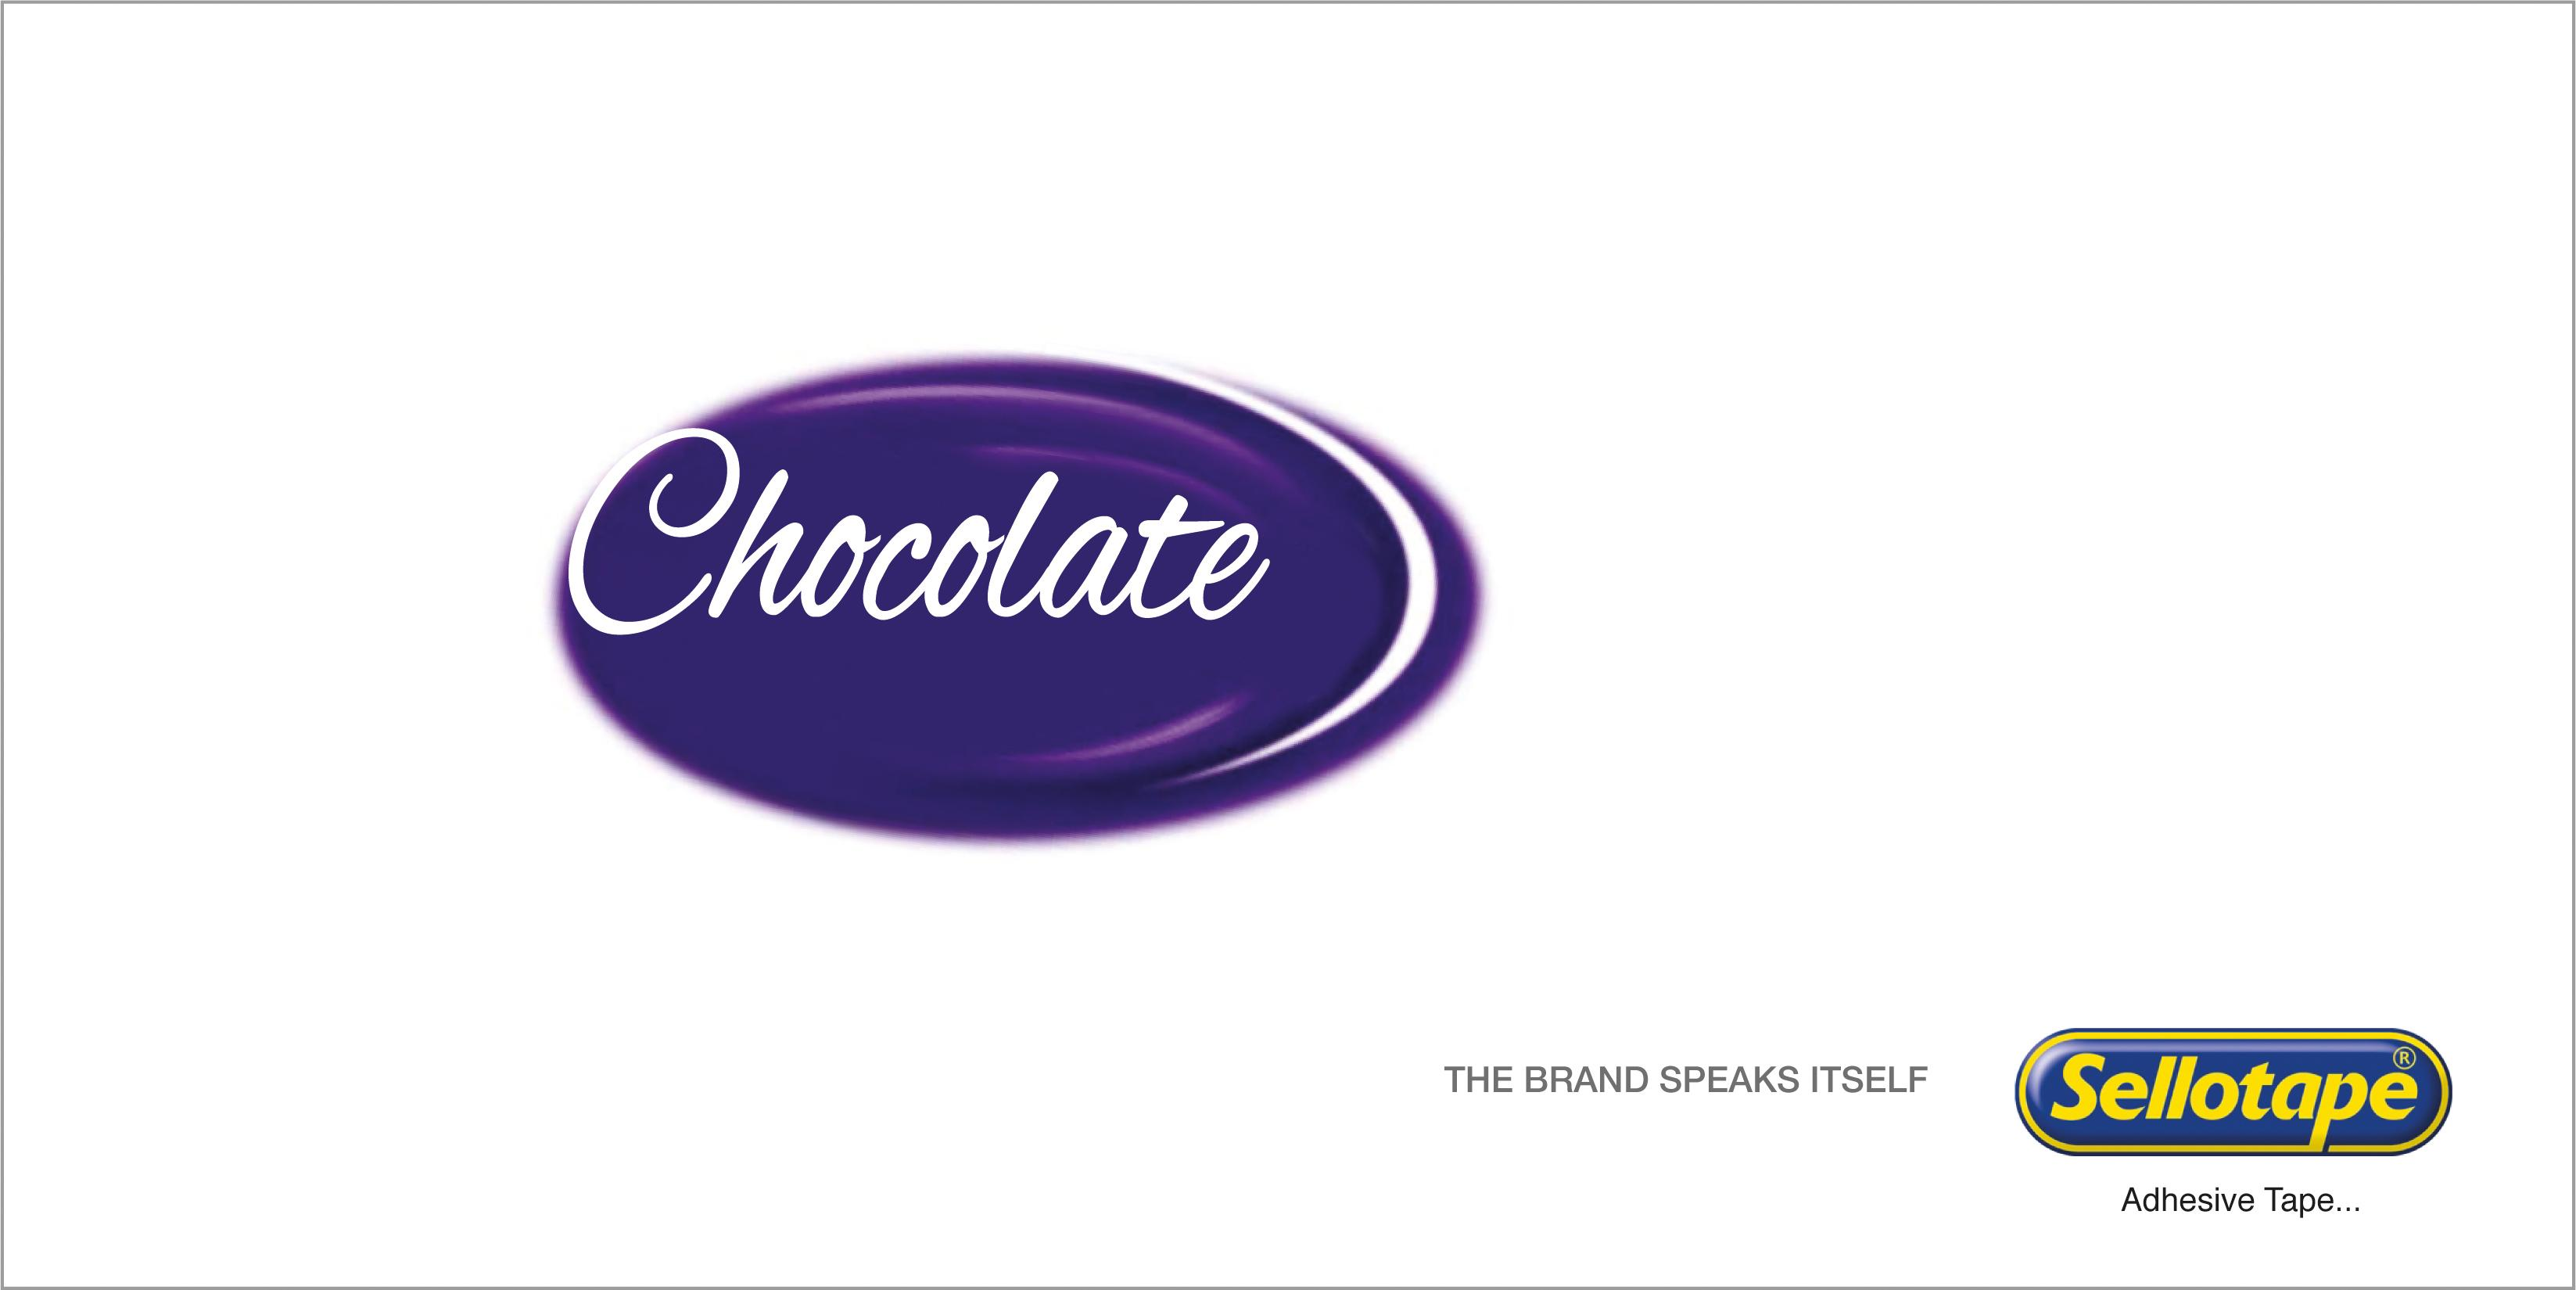 Sellotape Print Ad - Chocolate